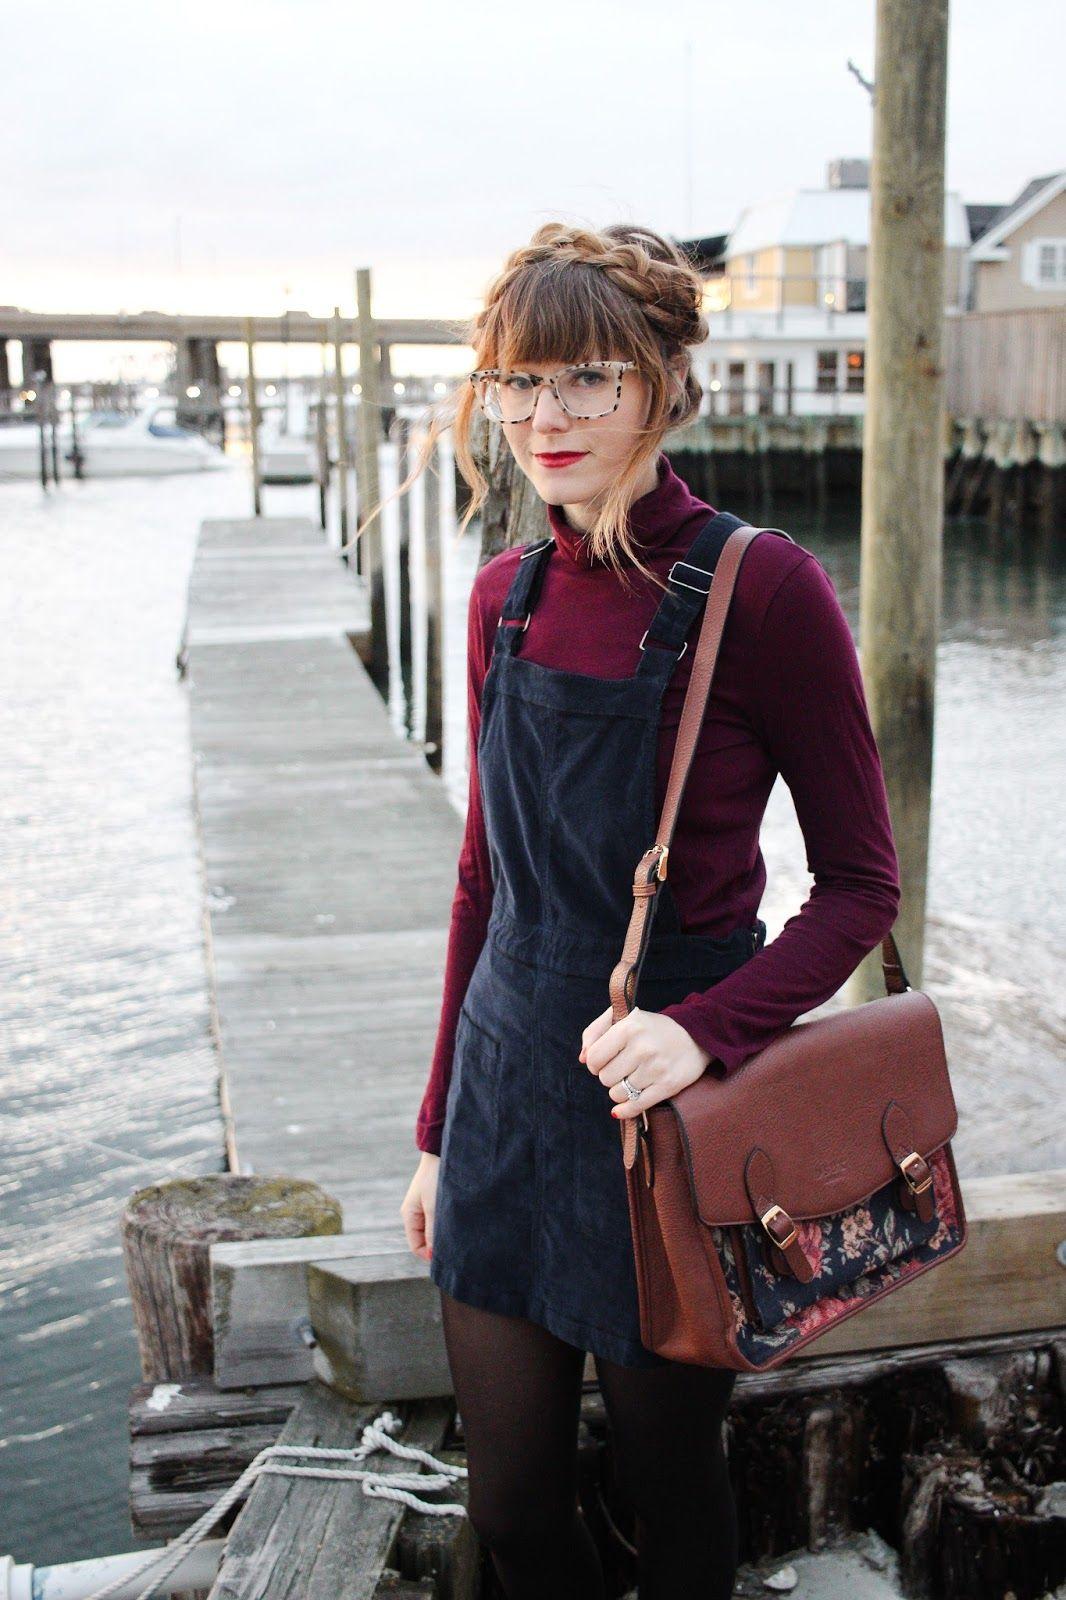 A Nyc Vintage Fashion Blog By Steffy Kuncman Sharing